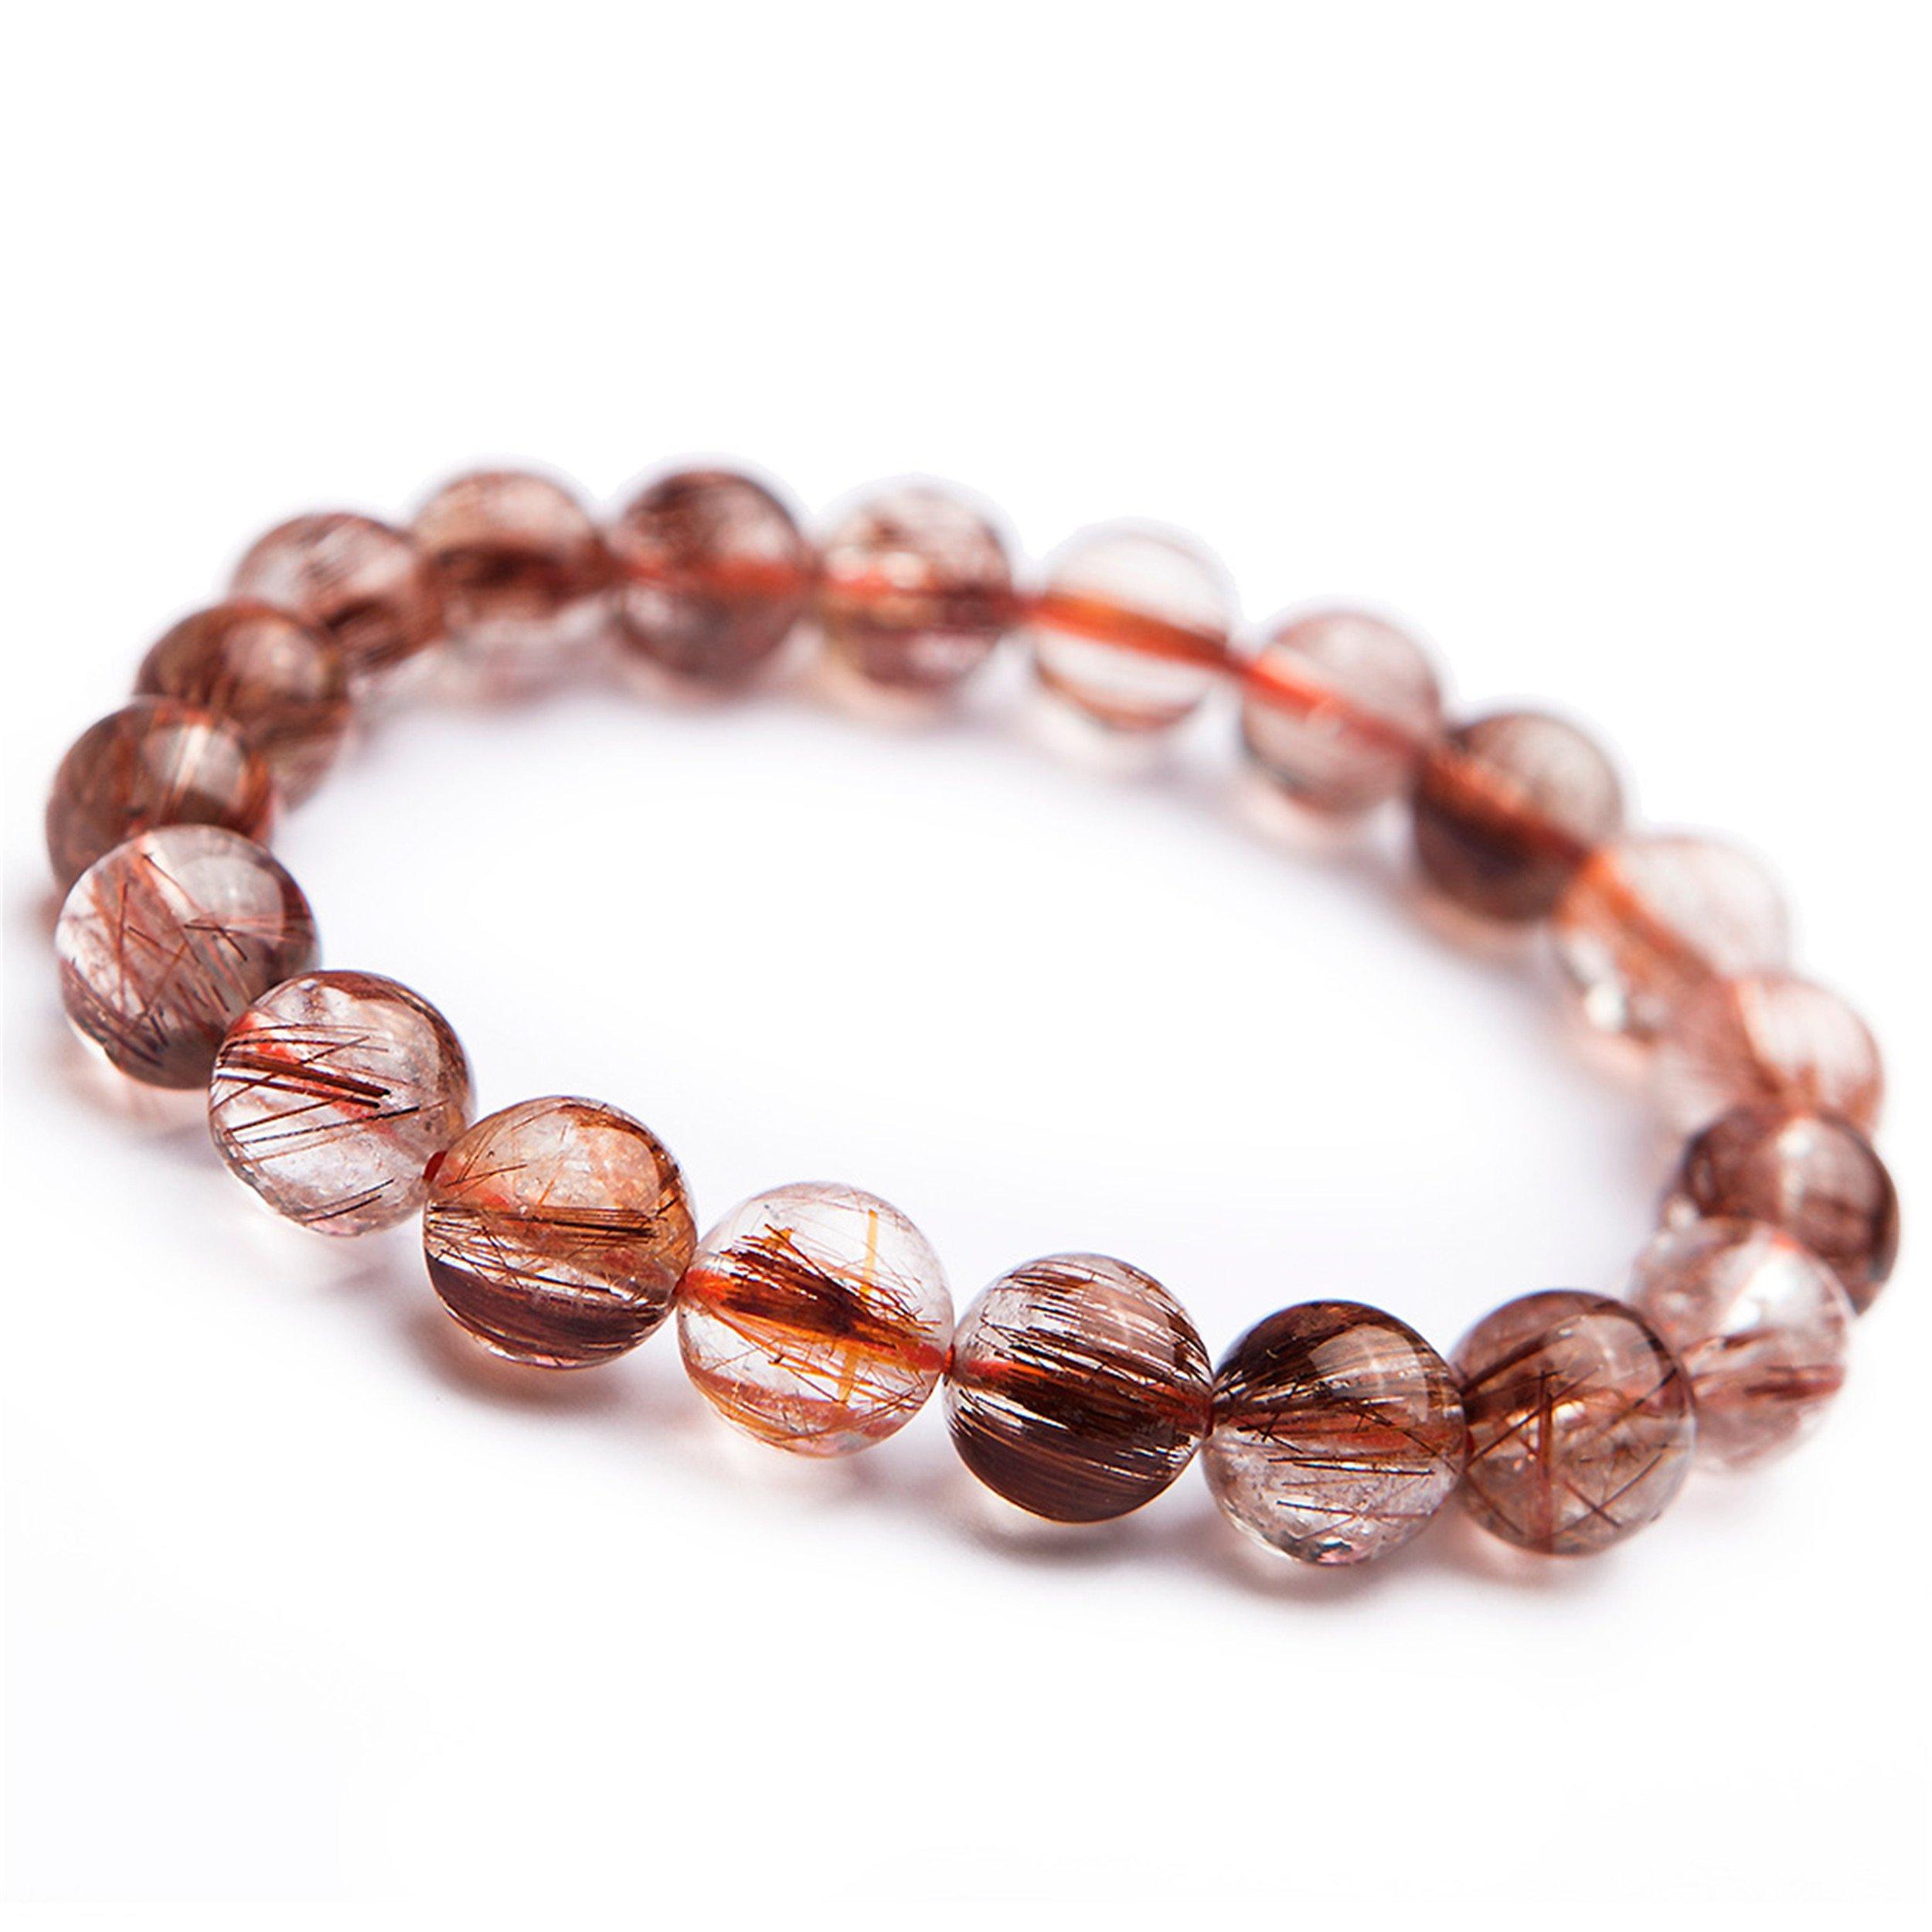 9mm Brazil Natural Copper Rutilated Quartz Crystal Round Bead Stretch Woman Bracelet